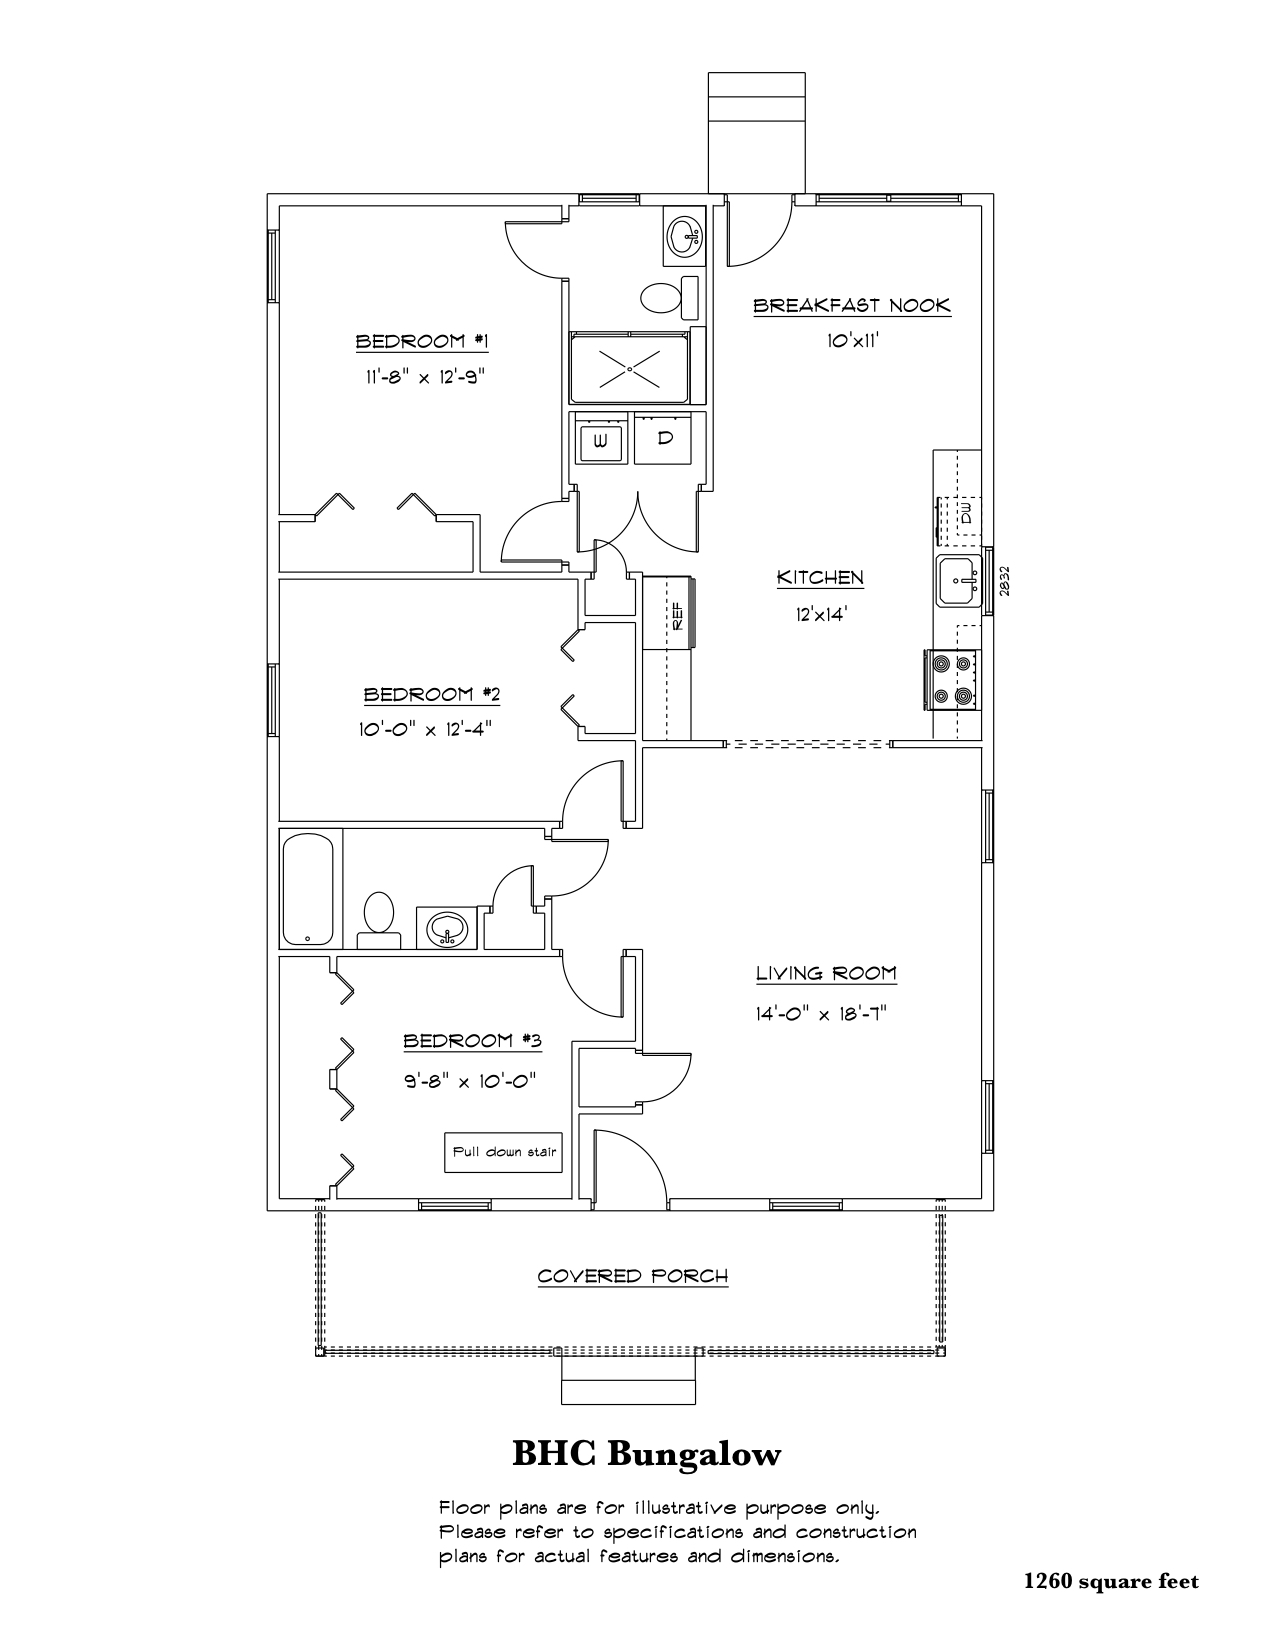 BHC_bungalow_Floorplan.jpg